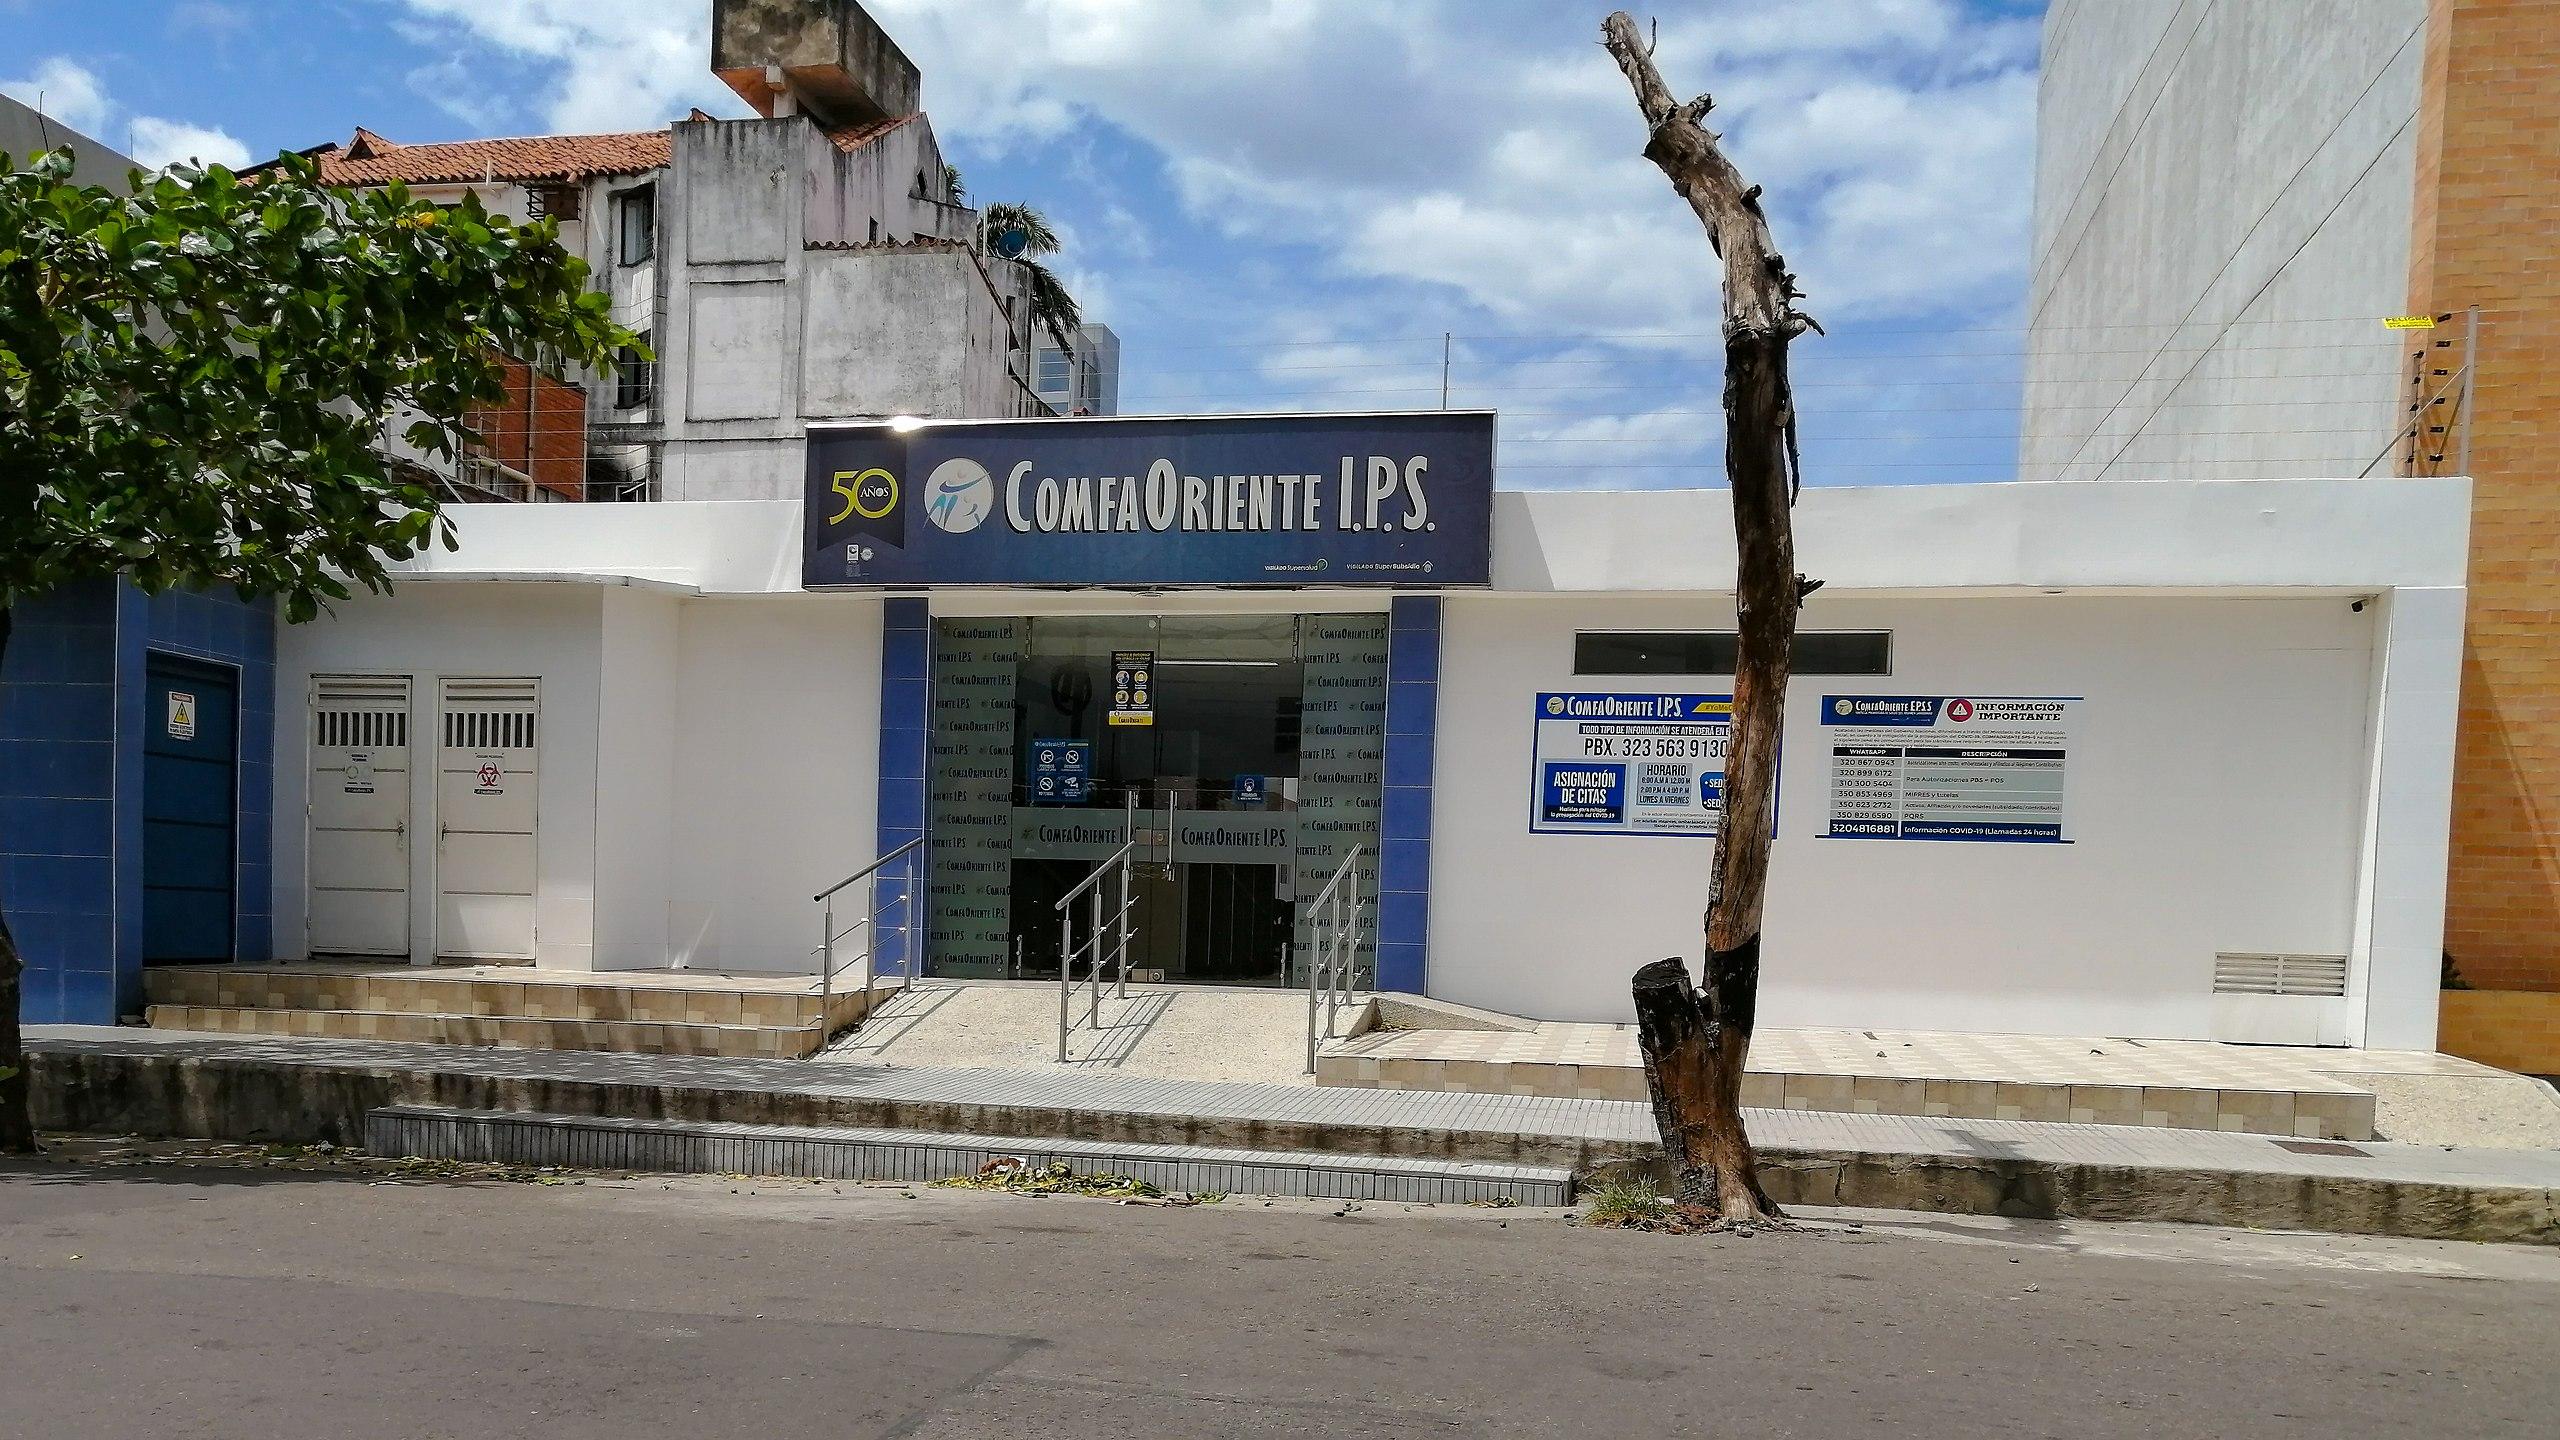 File:Ips Comfaoriente Cúcuta my 2021.jpg - Wikimedia Commons